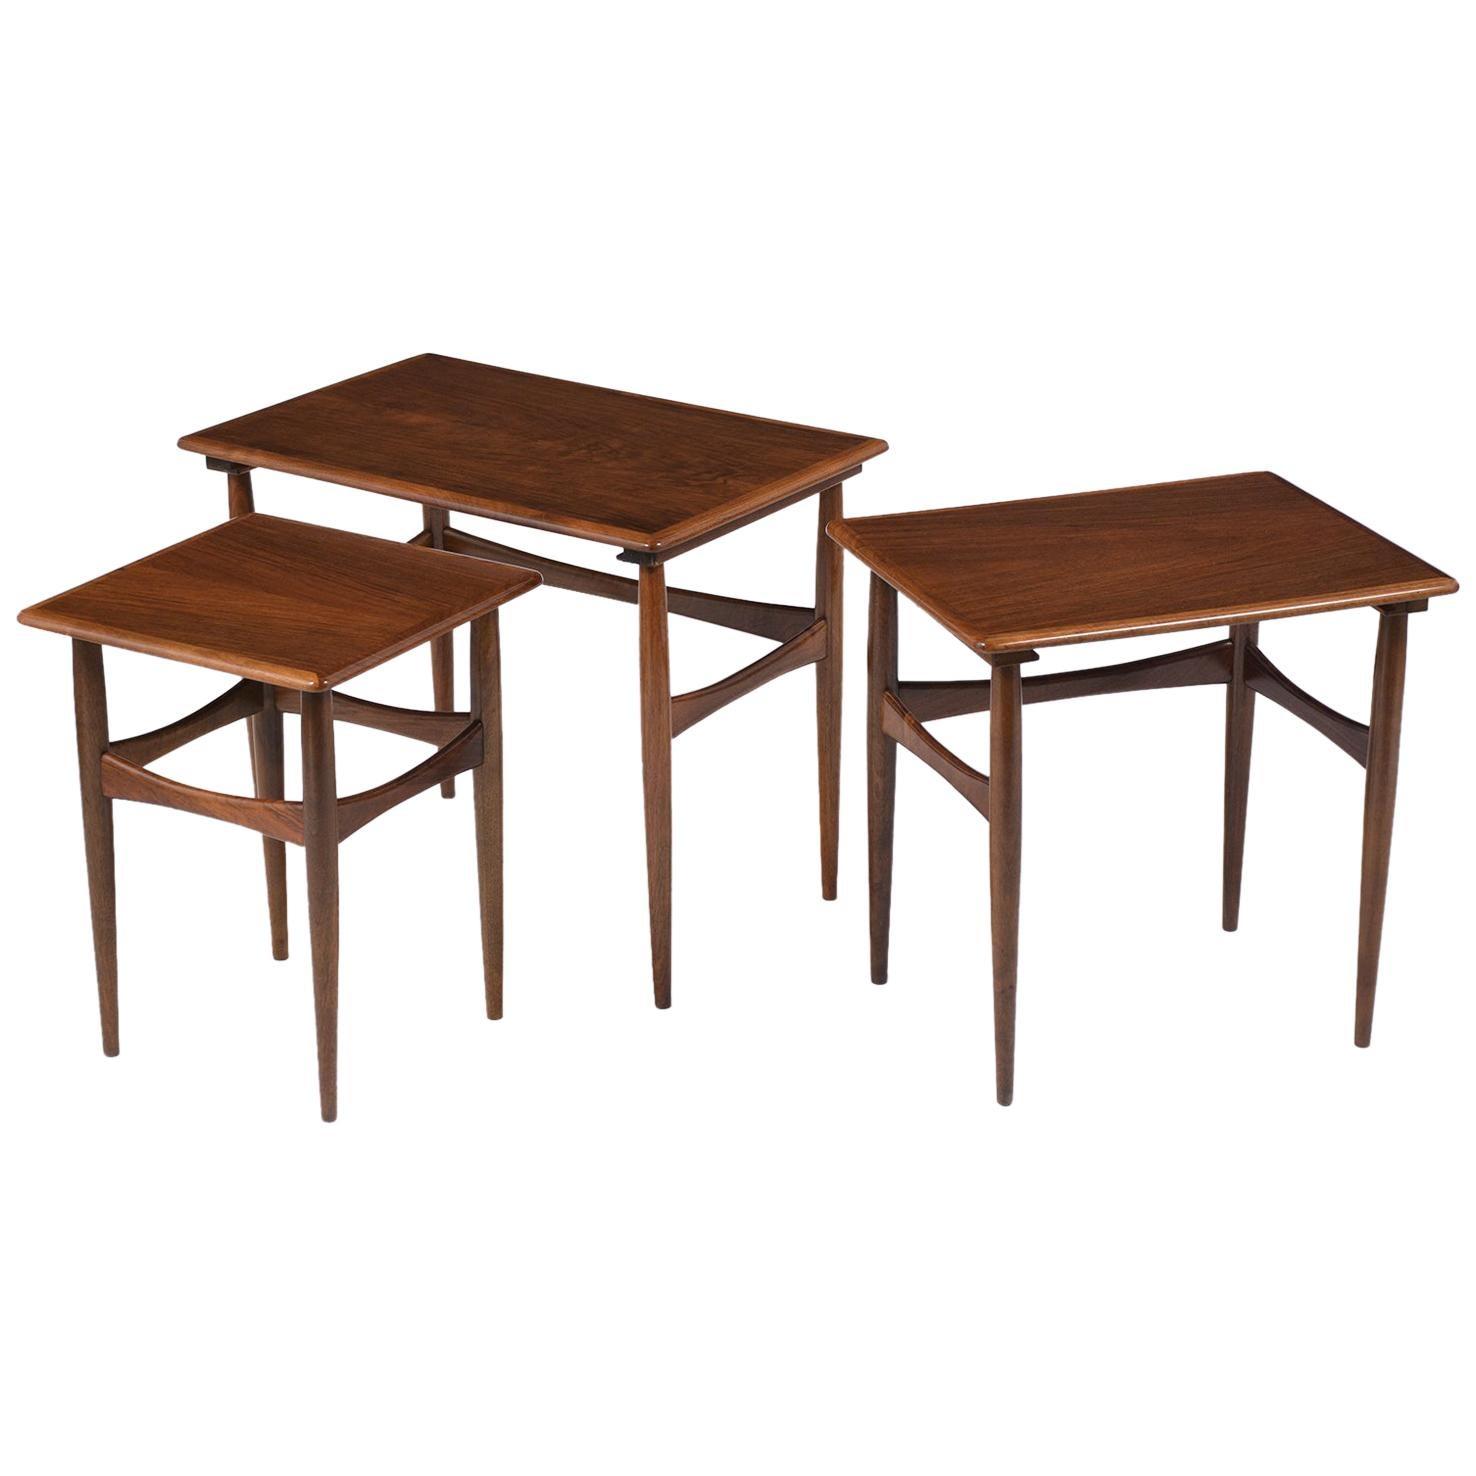 Set of Three Danish Nesting Tables